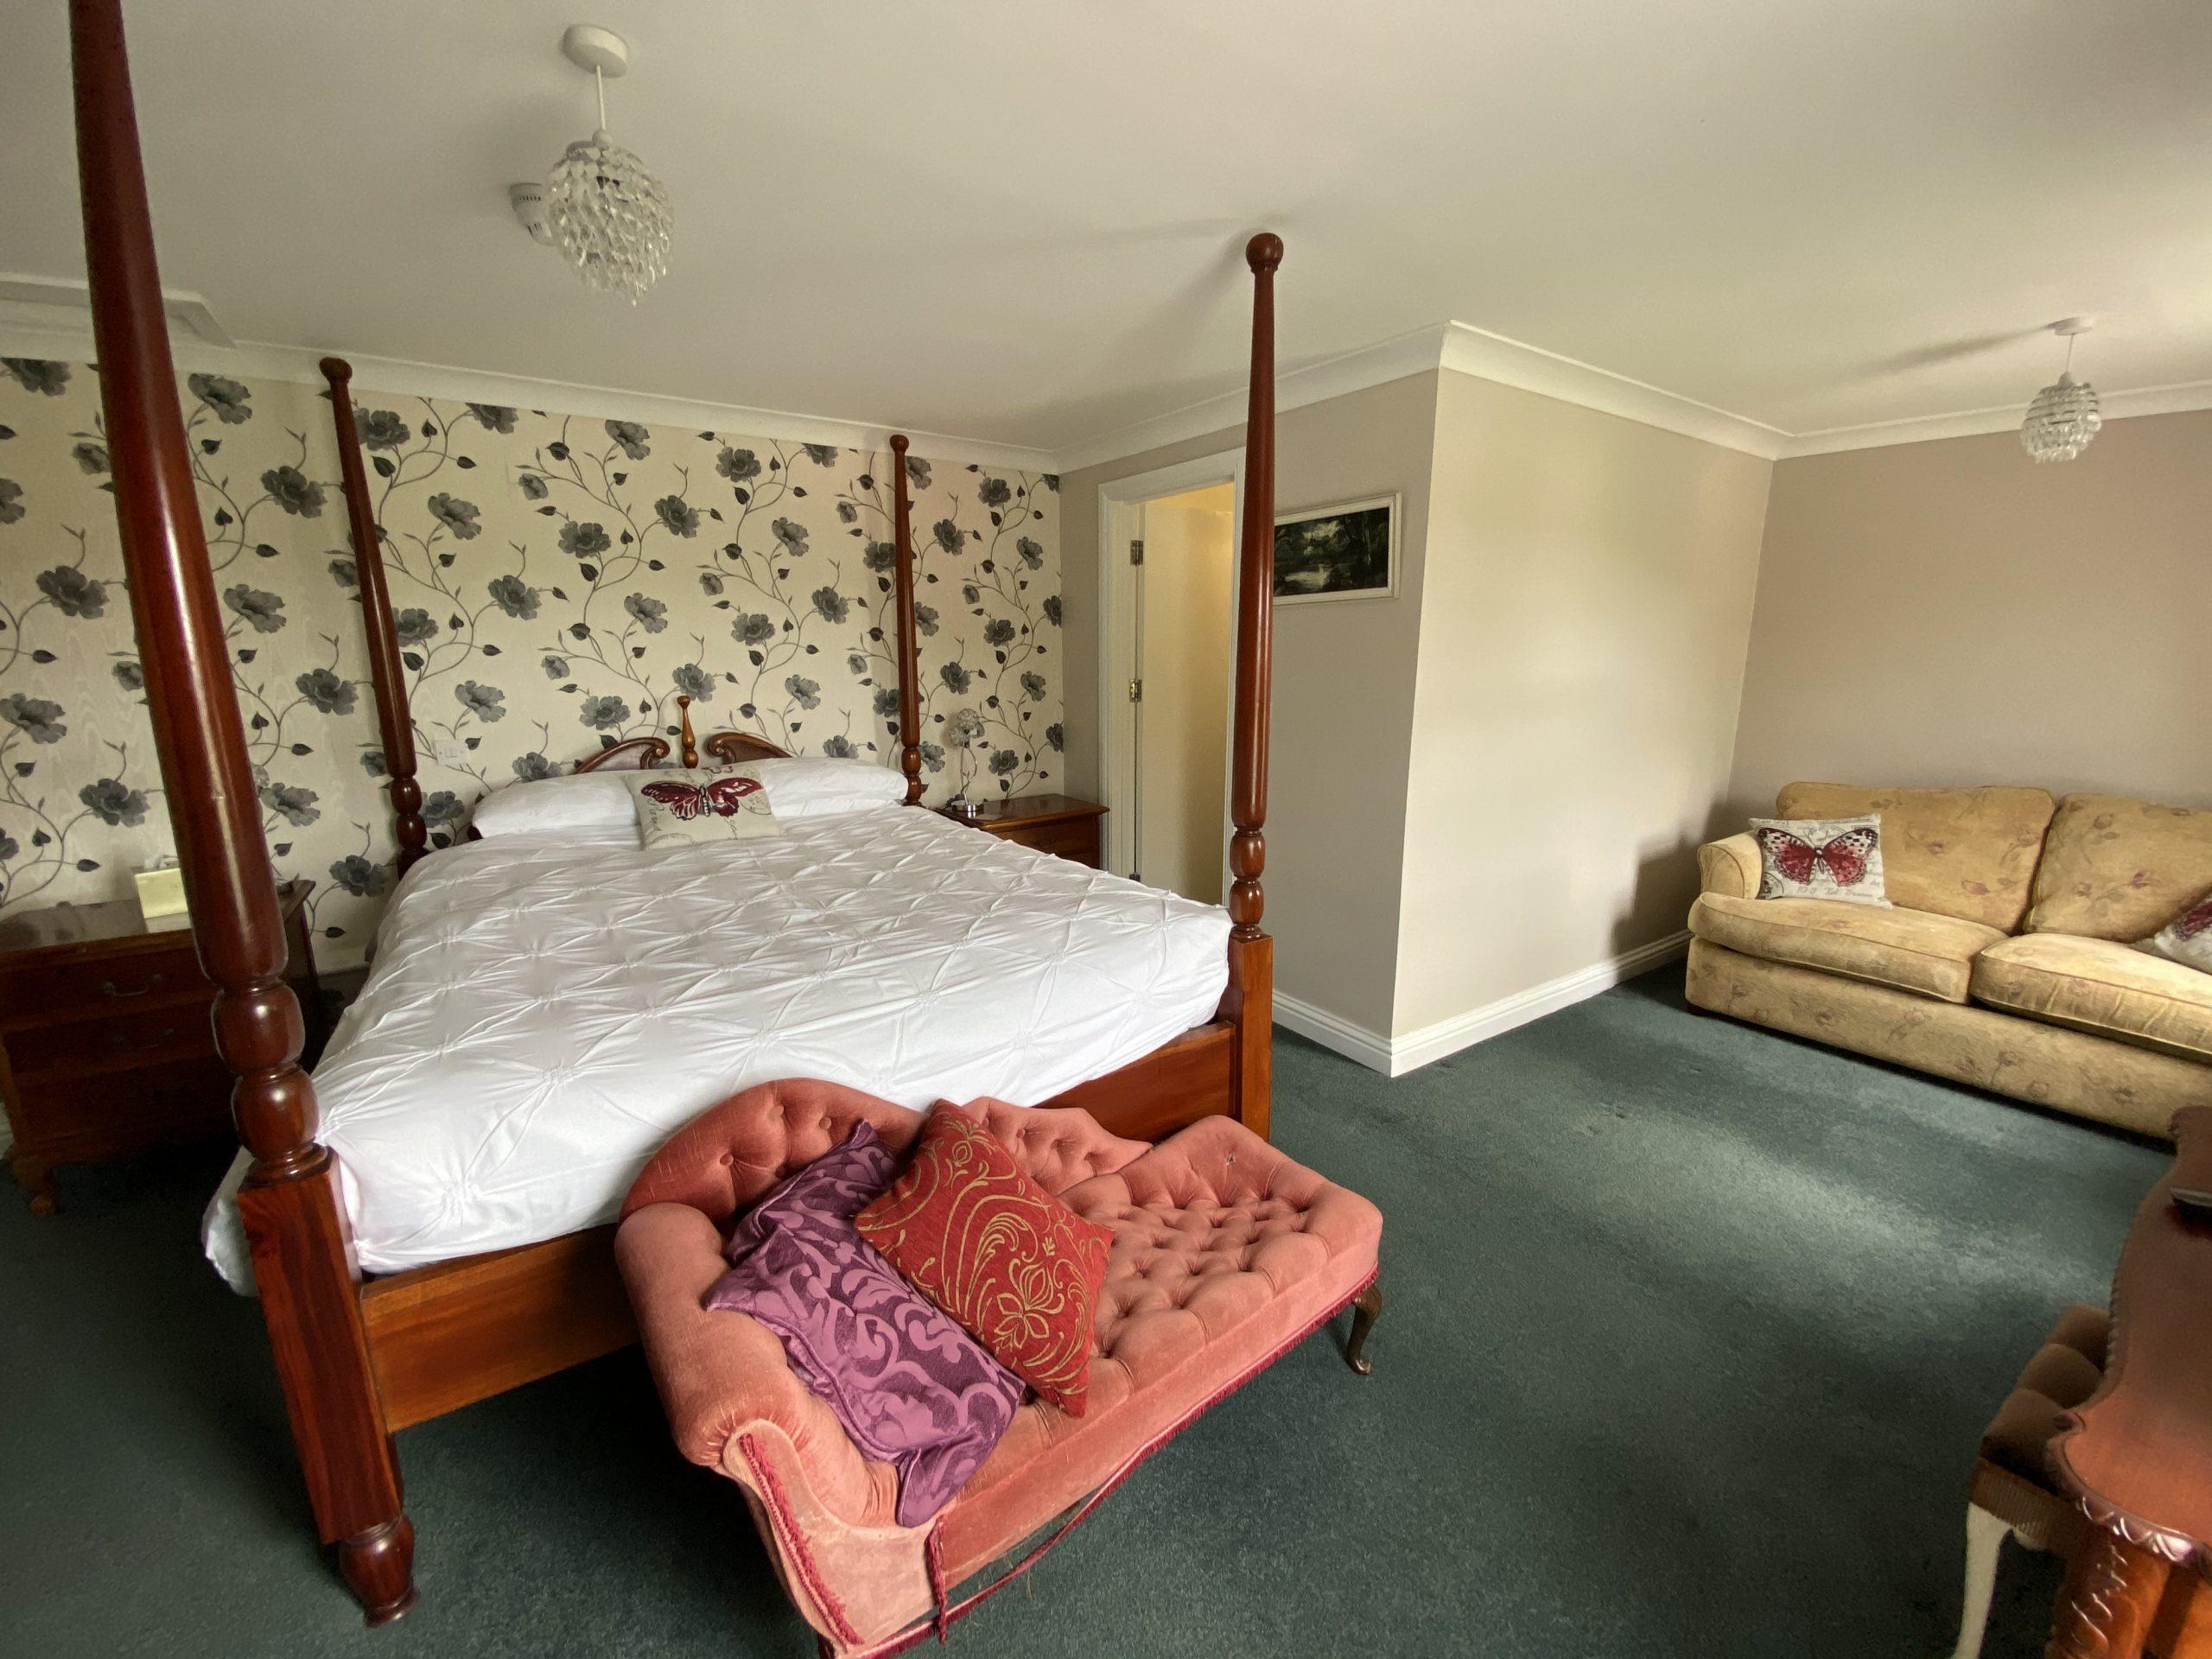 Room 4 bed & sofa